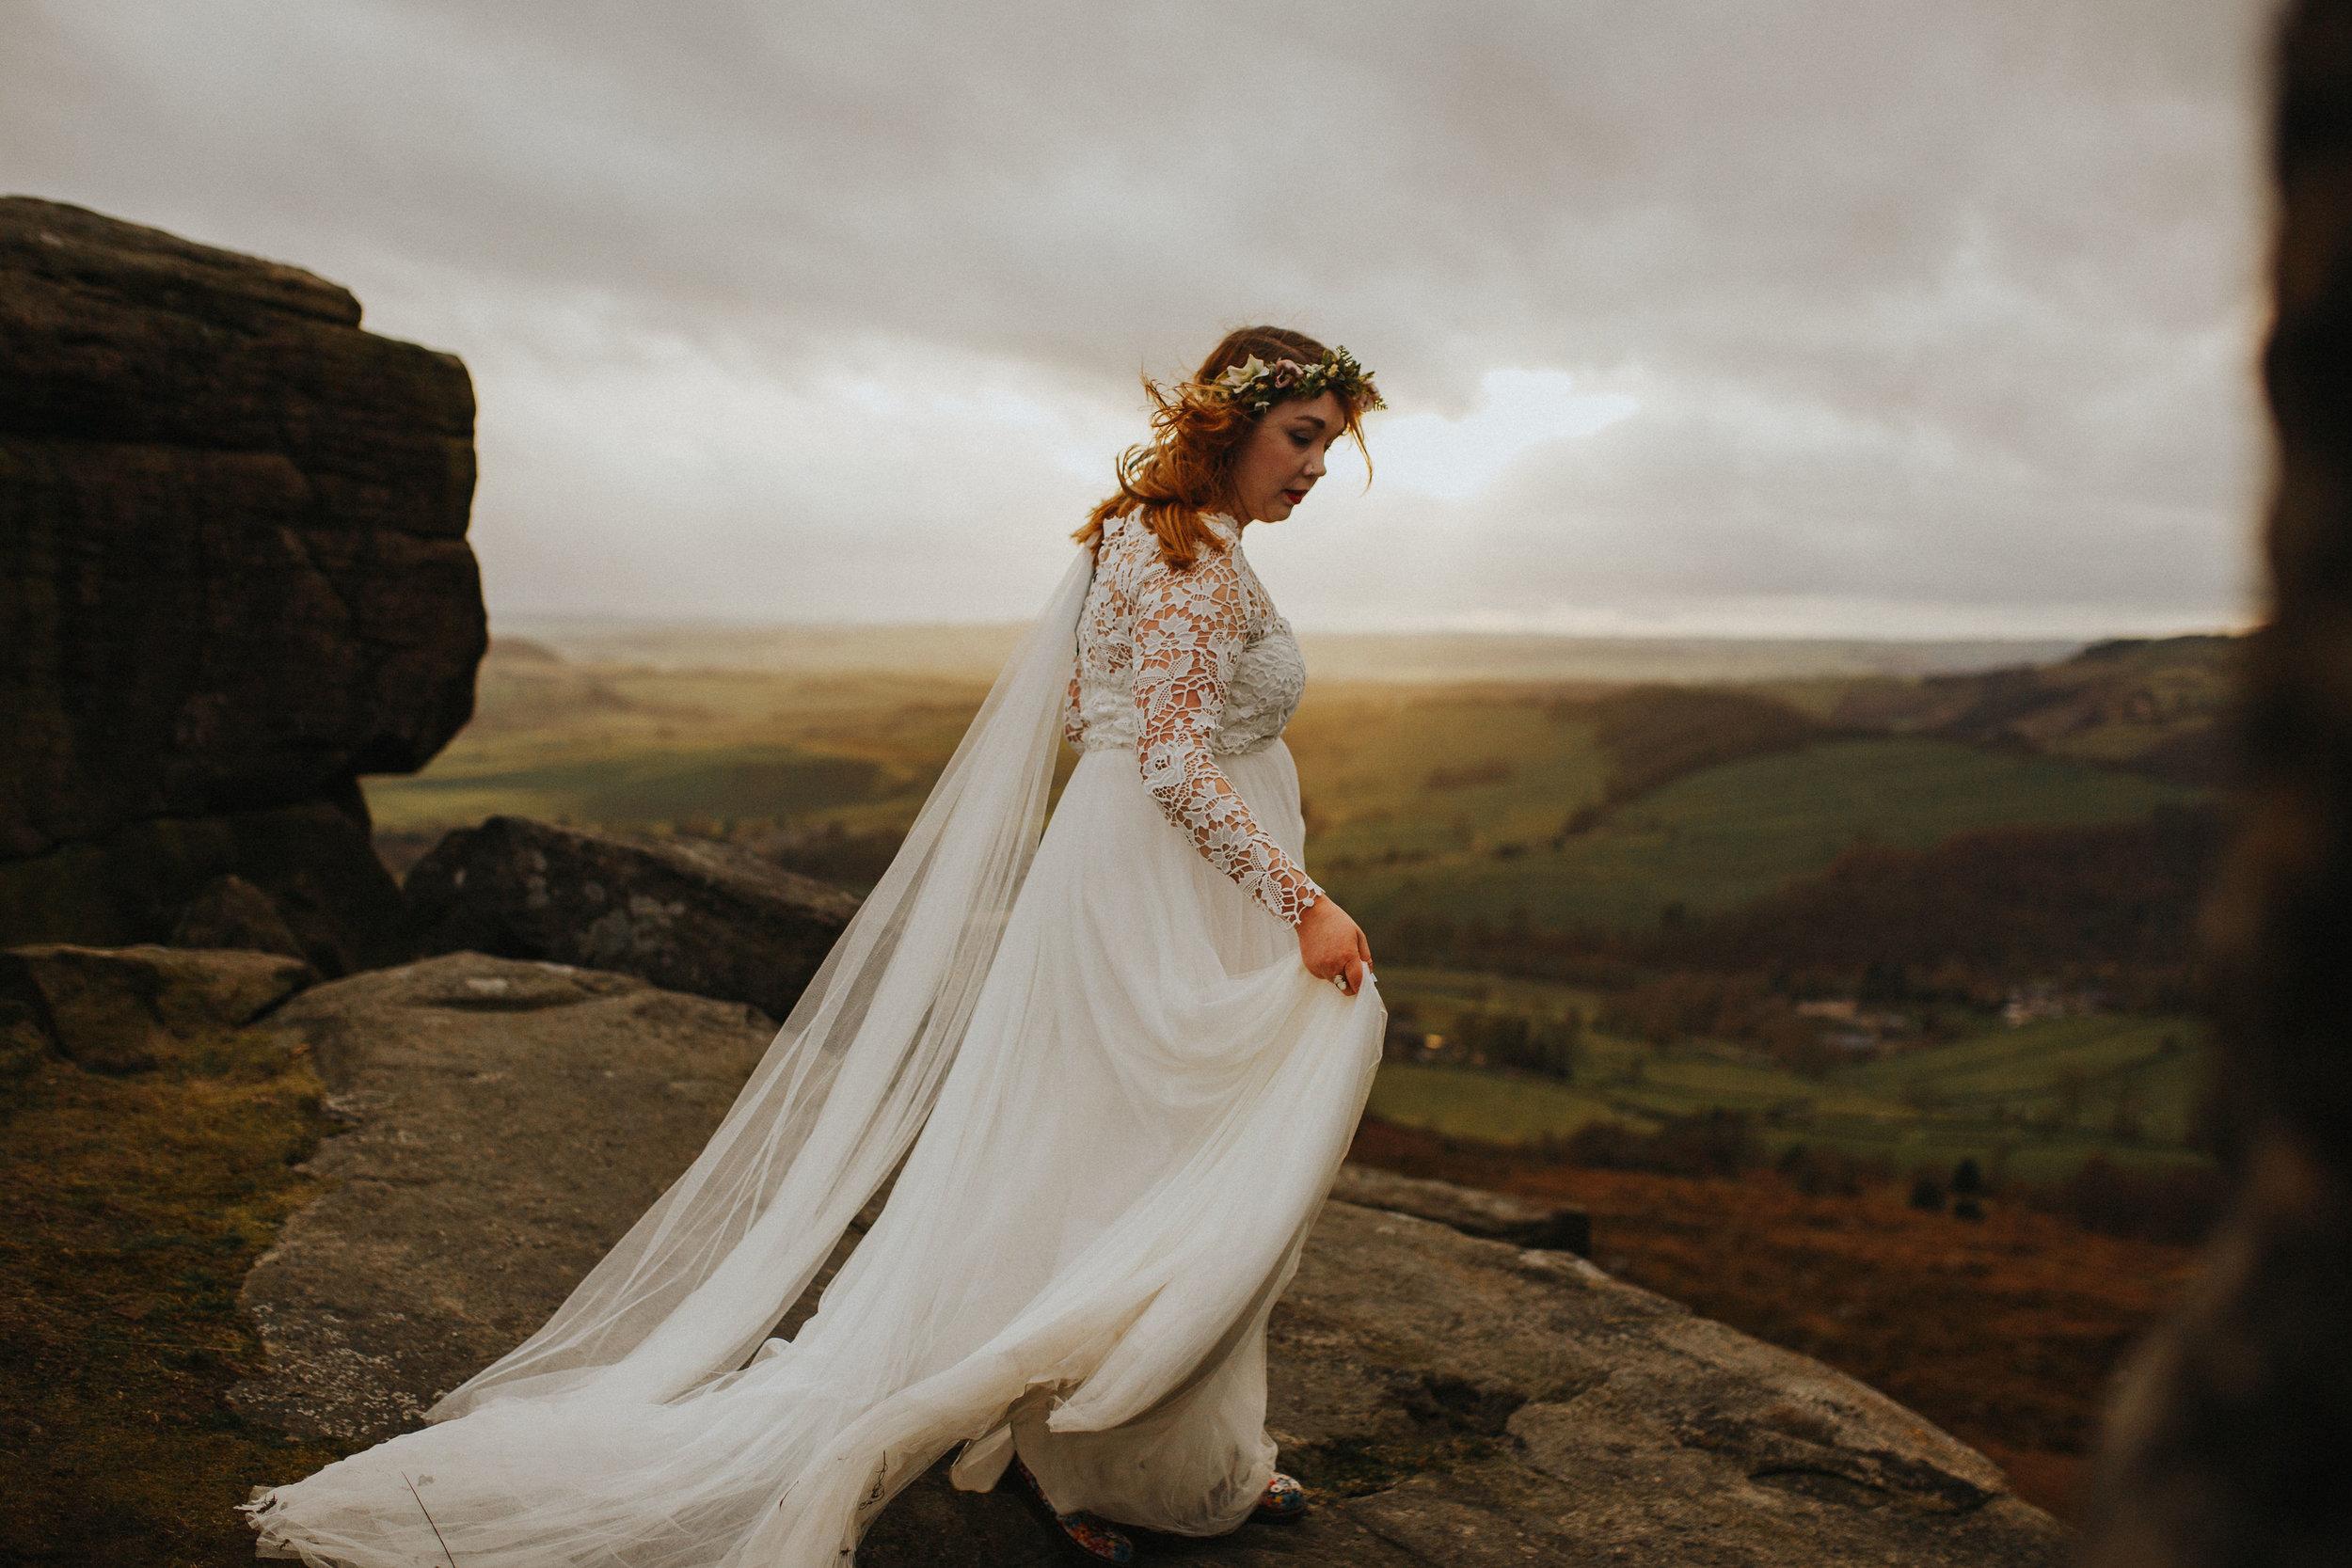 Rosie-bespoke-lace-long sleeved-tulle-wedding-dress-winter-peak district-susanna greening-20.jpg